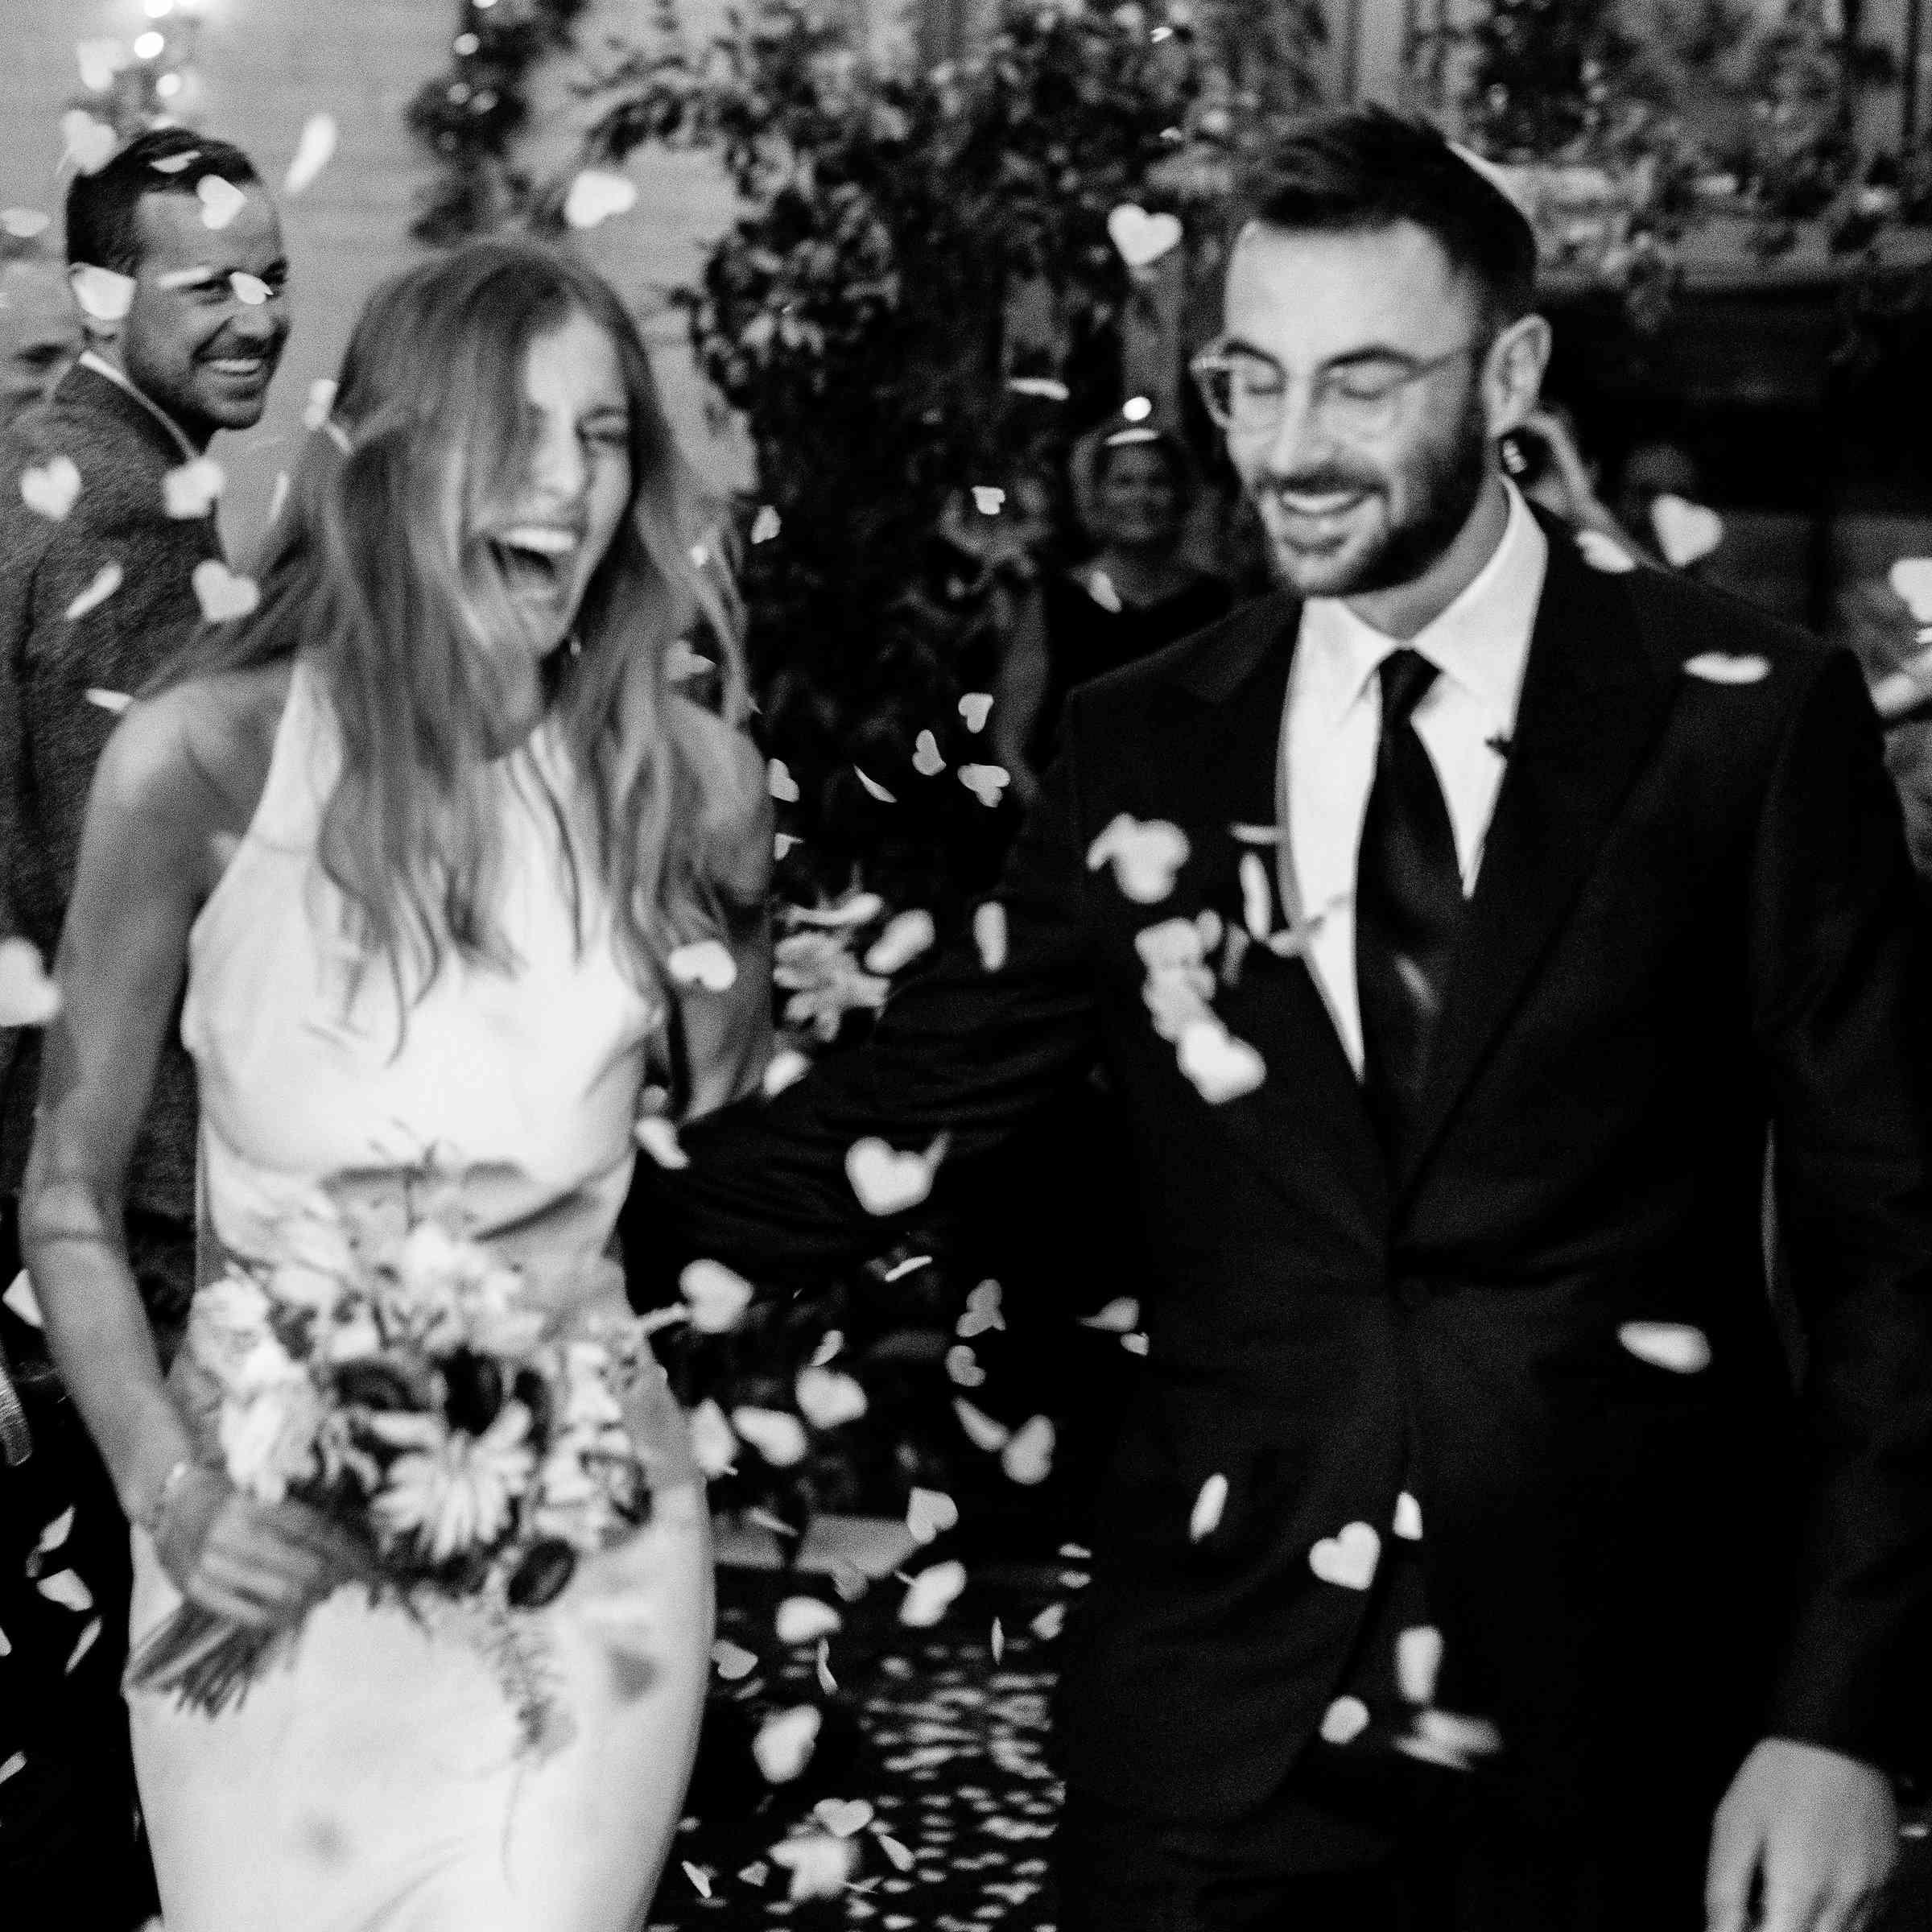 Bride and groom flower petals